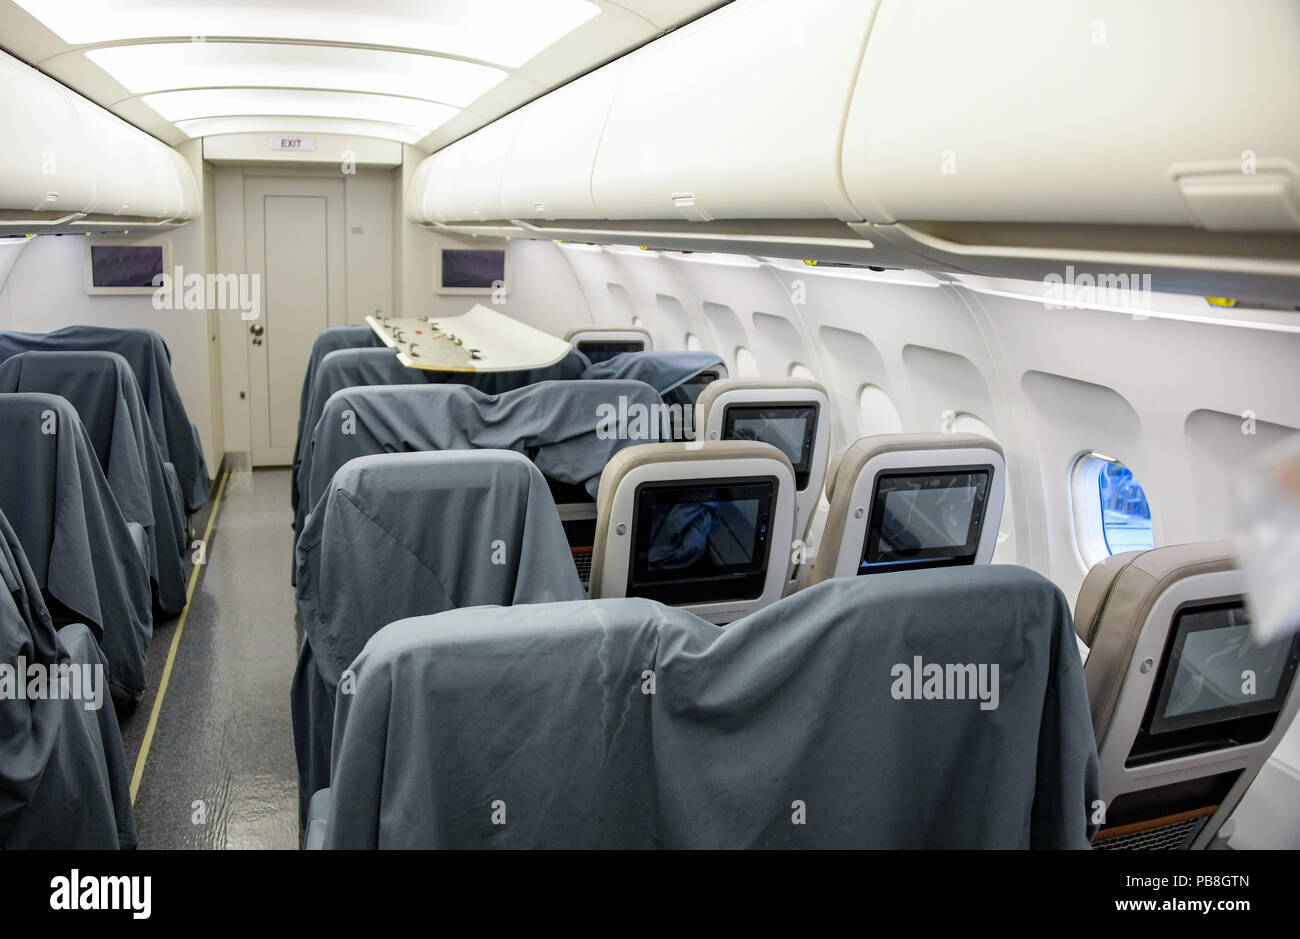 Airbus A321 Interior Stock Photos Airbus A321 Interior Stock